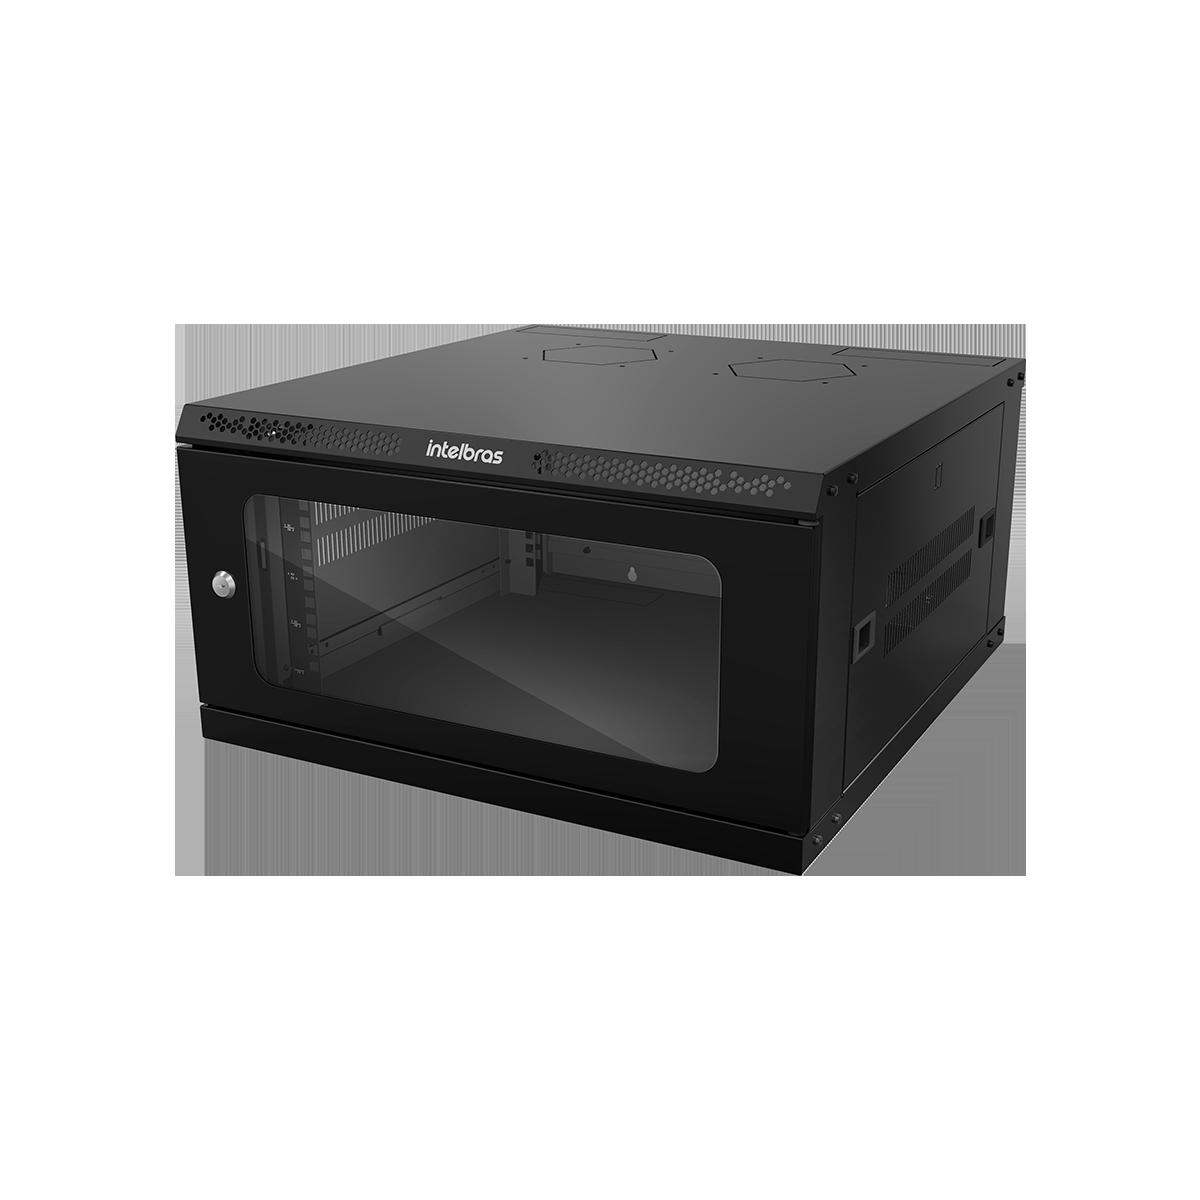 "Mini Rack desmontável de parede 5U – 19"" x 570mm MRD 557 intelbras - JS Soluções em Segurança"